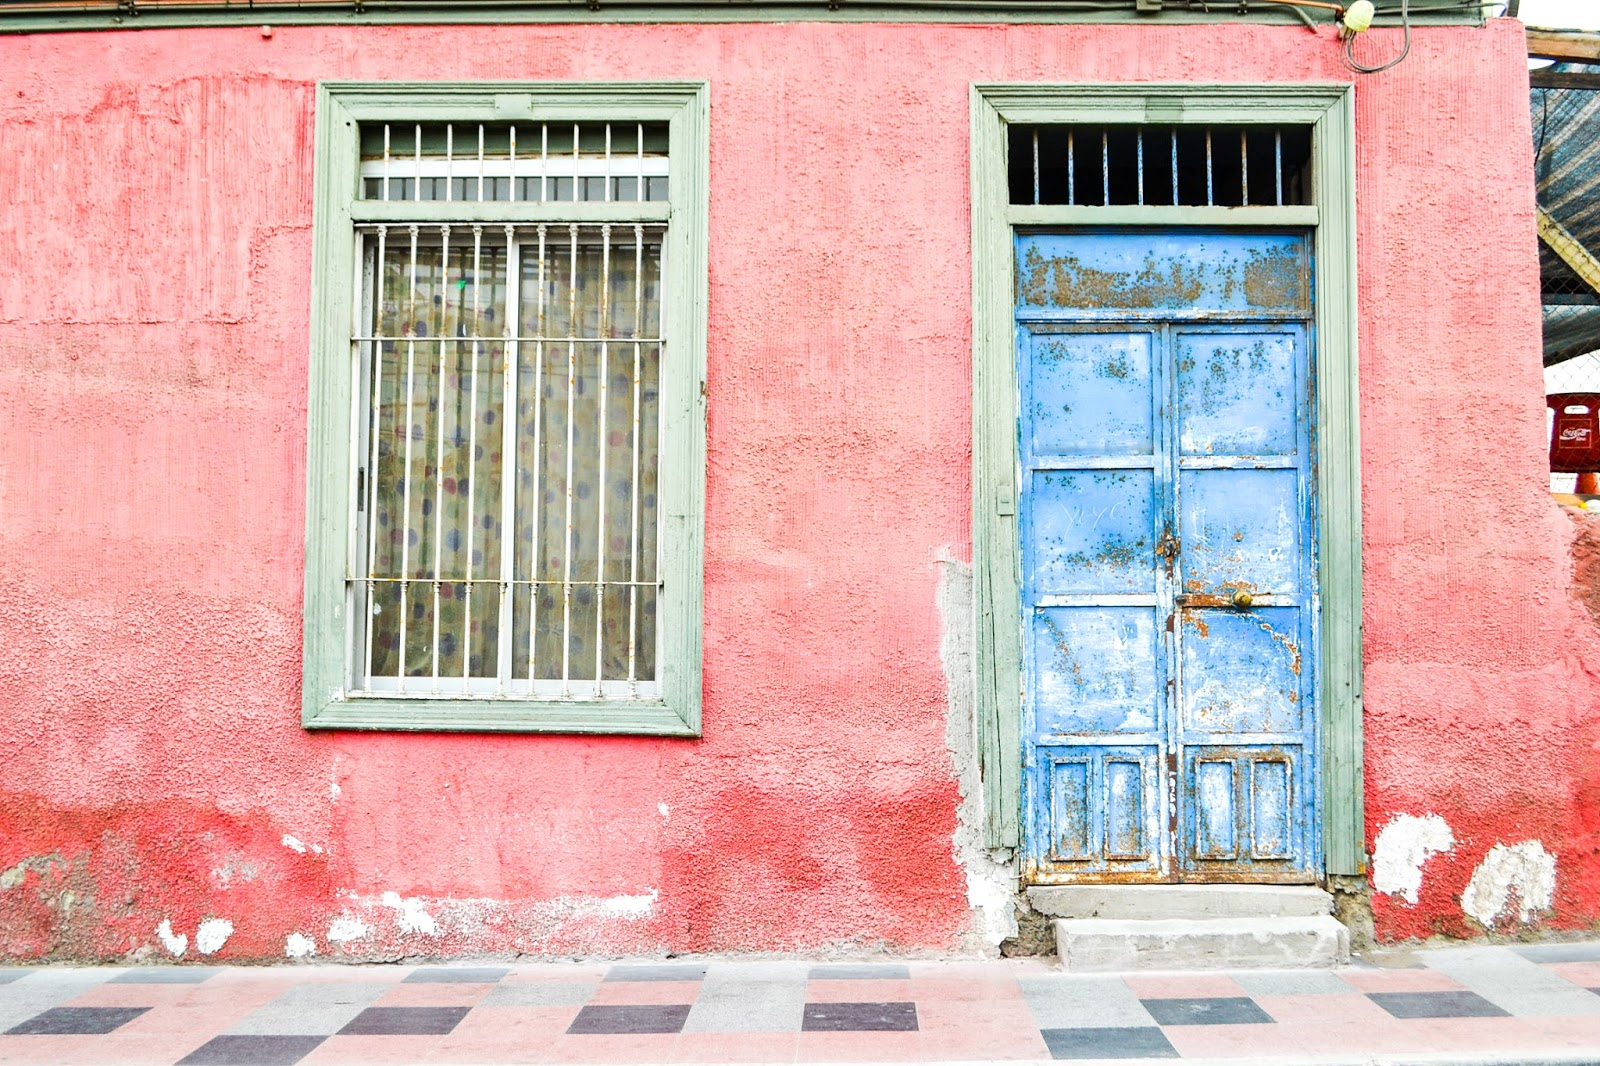 Arica, Chile, ejnets.com